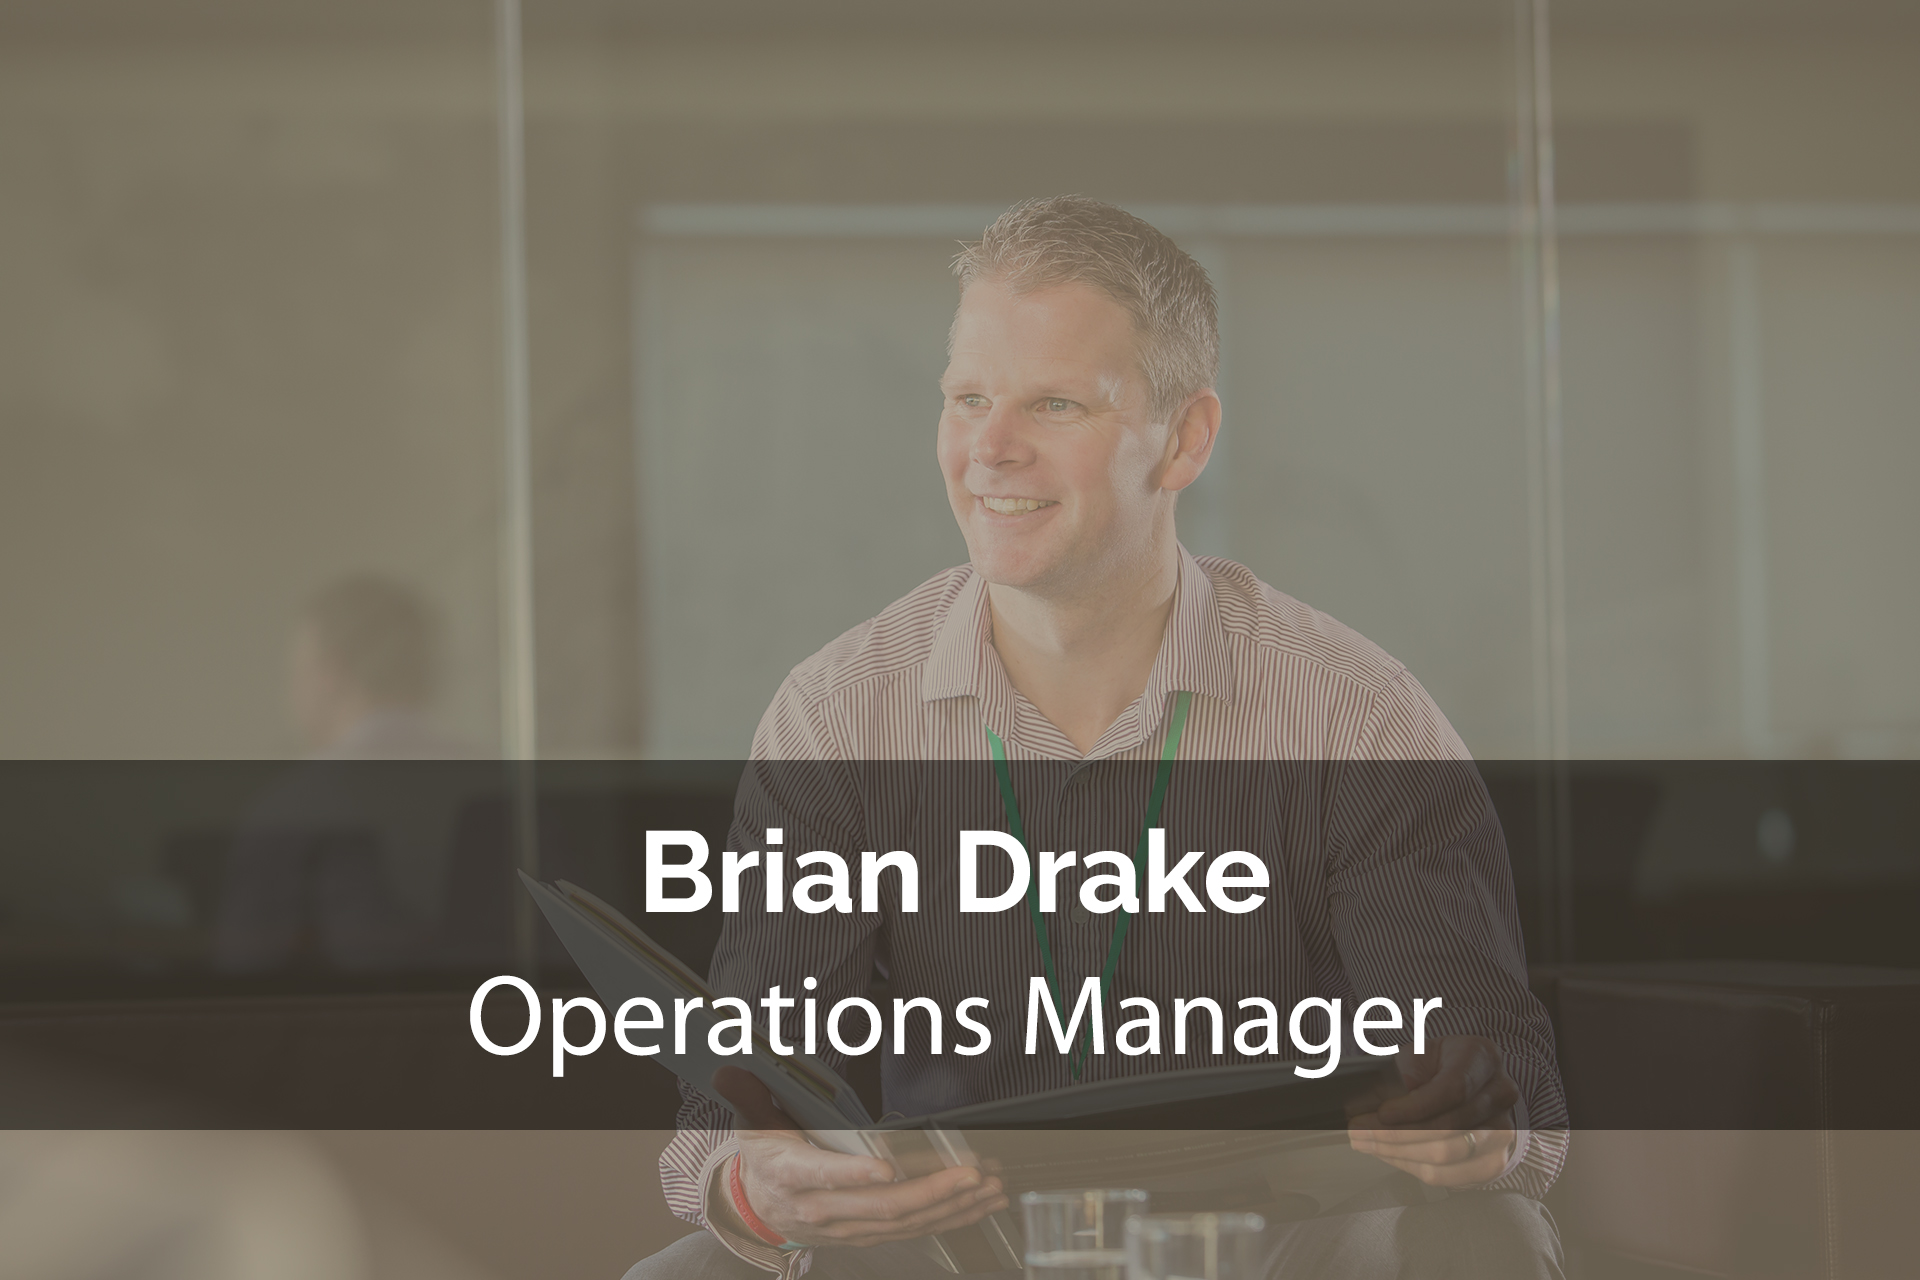 Brian Drake